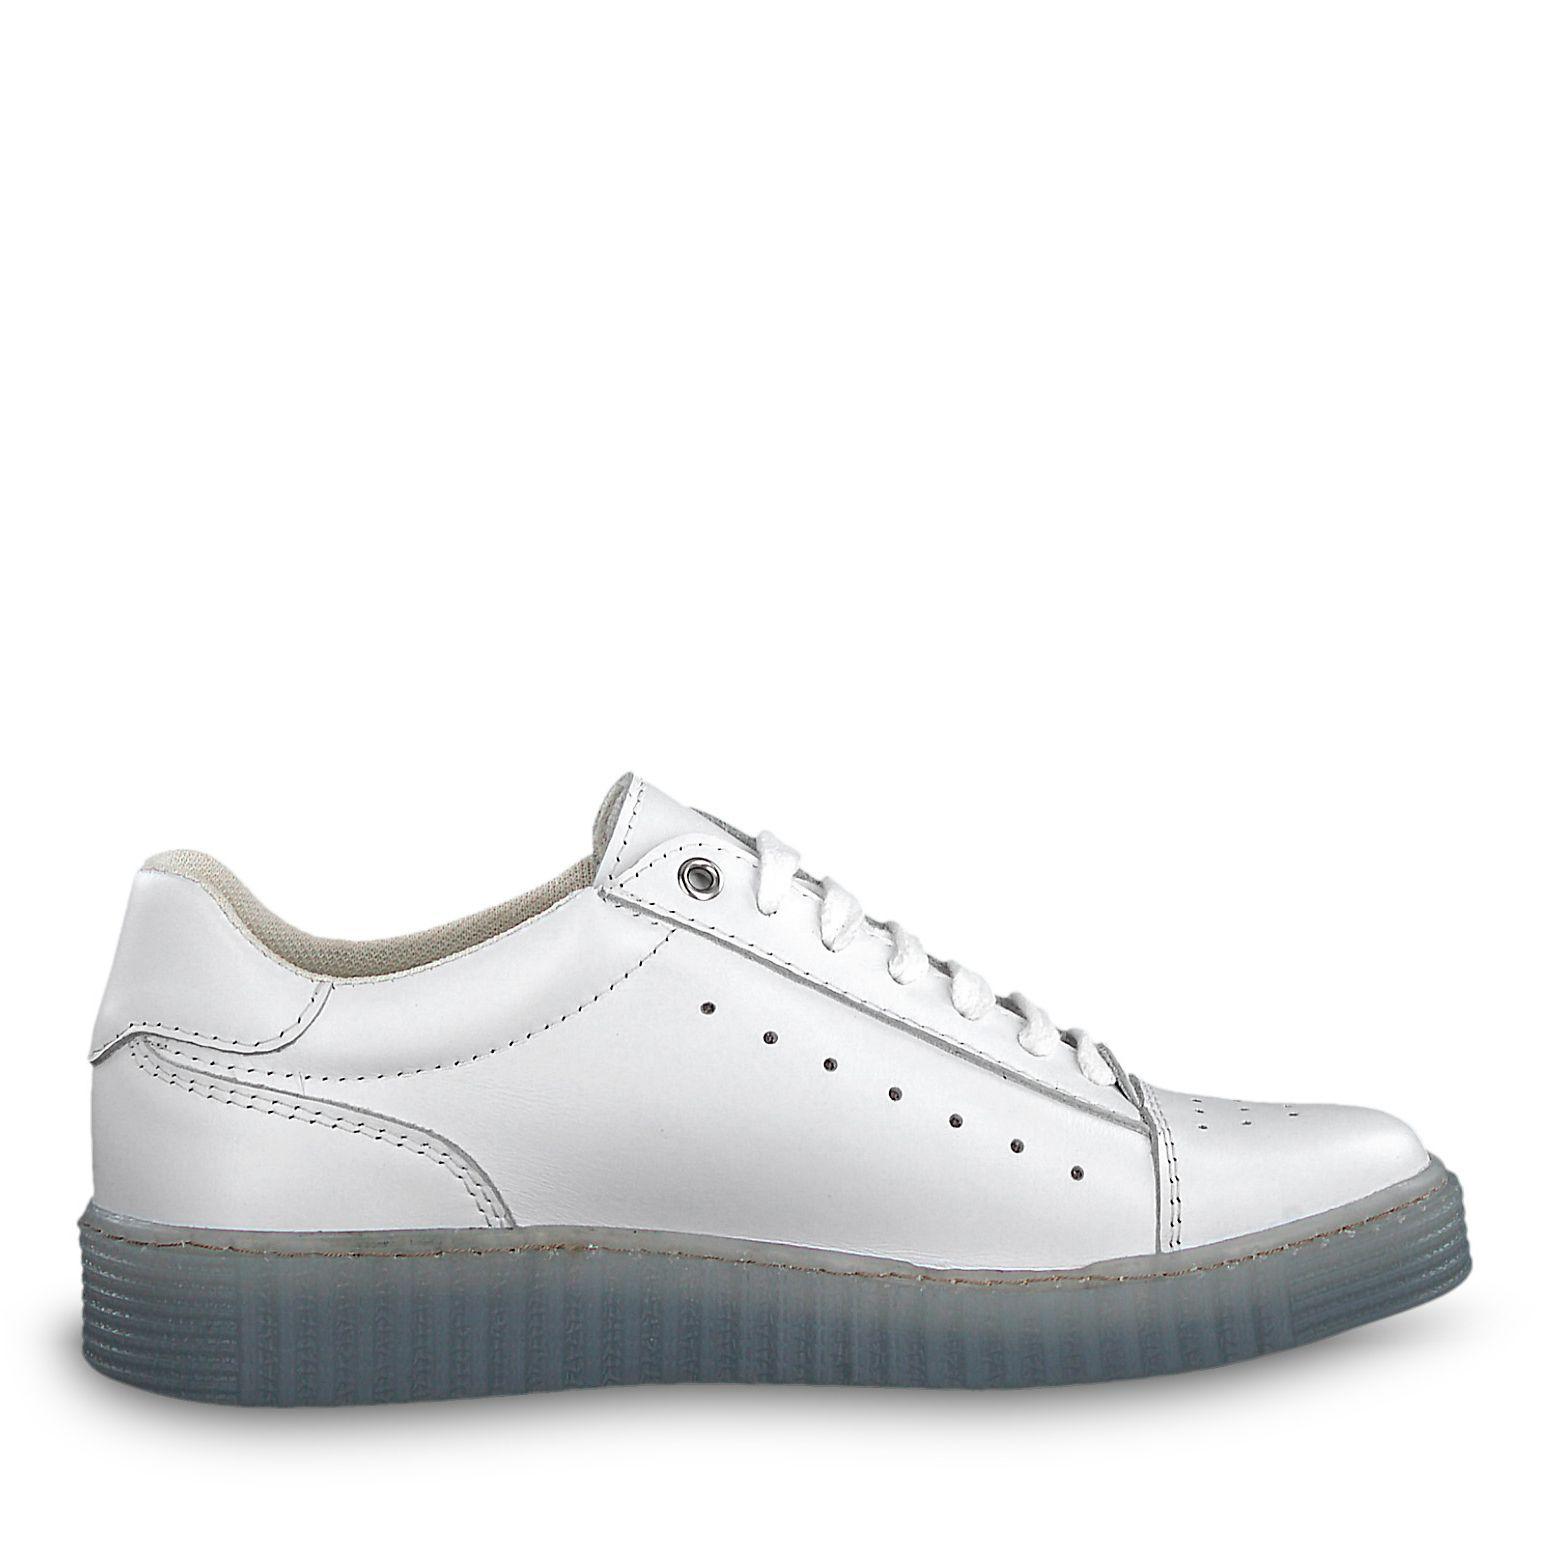 Chaussures Tamaris Mandy 8PkTH3